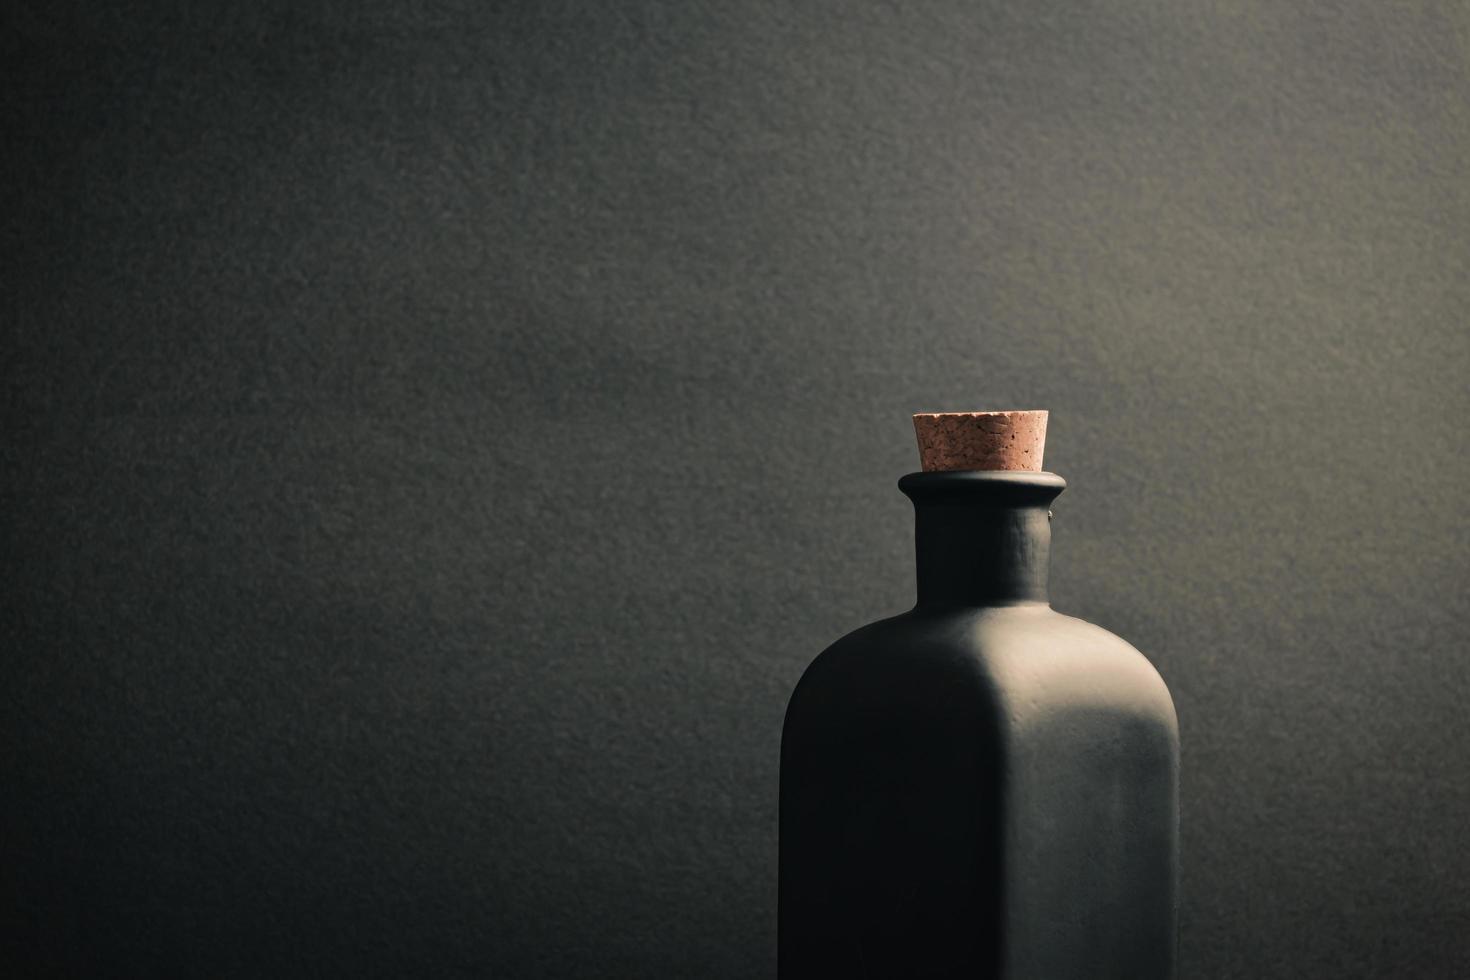 botella de cerámica negra foto